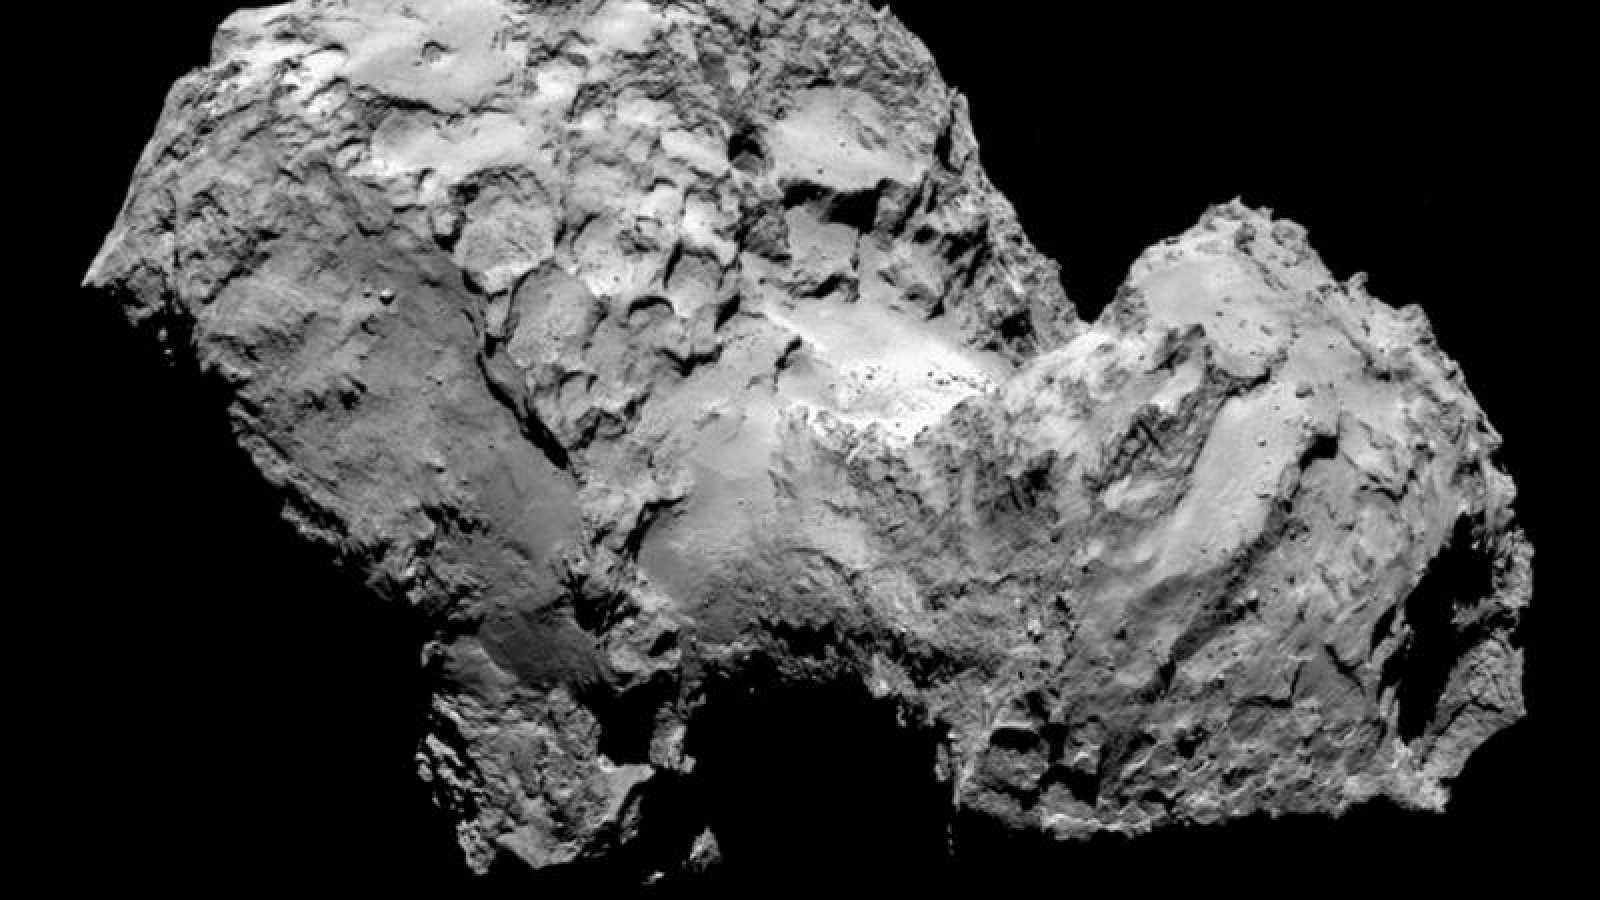 Imagen del cometa 67P tomada por la cámara OSIRIS, a bordo de la misión Rosetta.